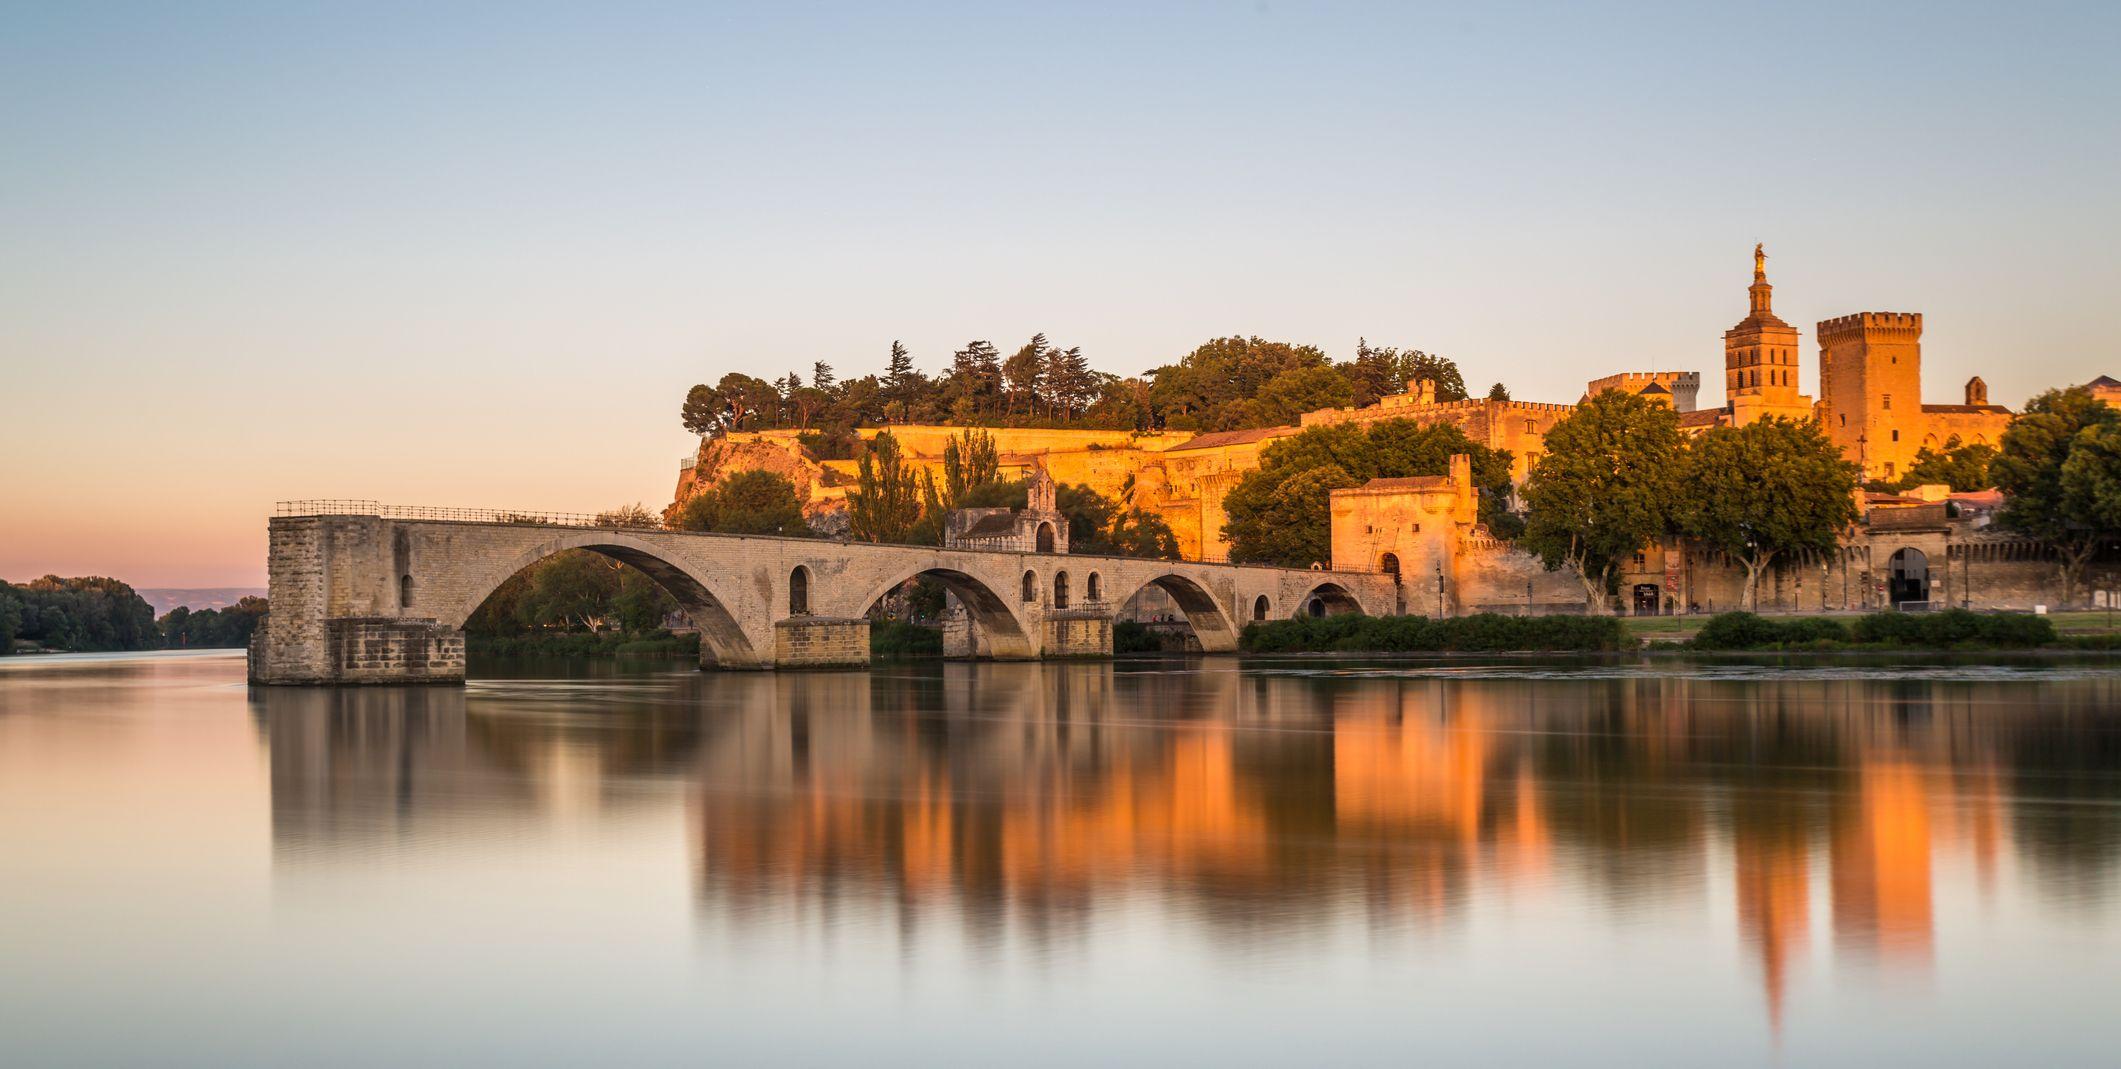 Pont Saint-Benezet on Rhone River and Avignon Cathedral at sunset,Avignon